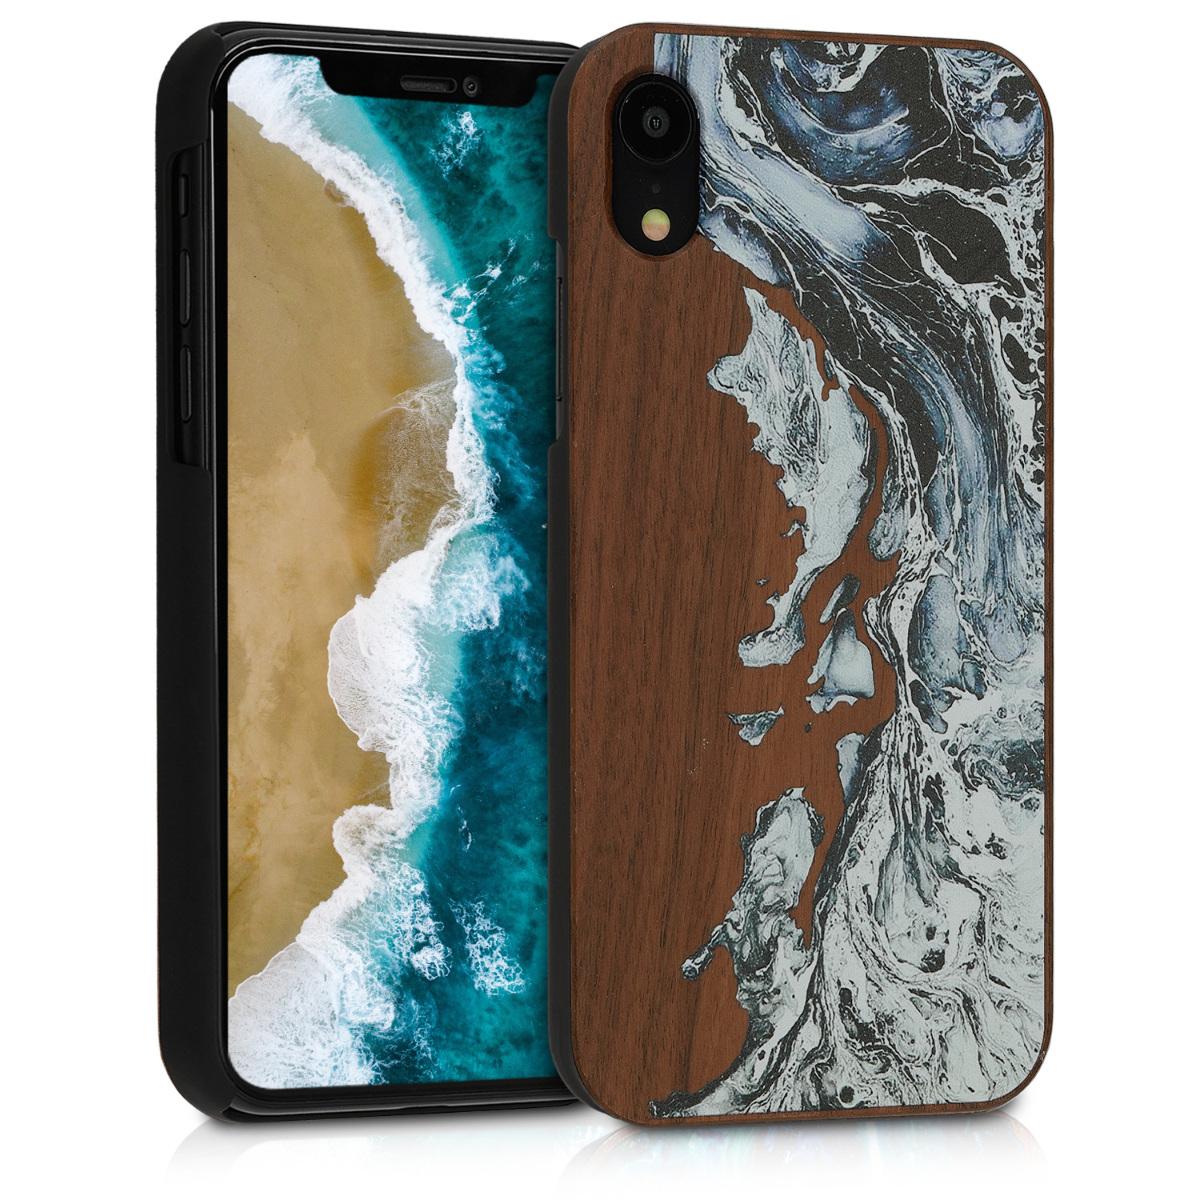 KW Ξύλινη Θήκη iPhone XR - Brown (46660.02)